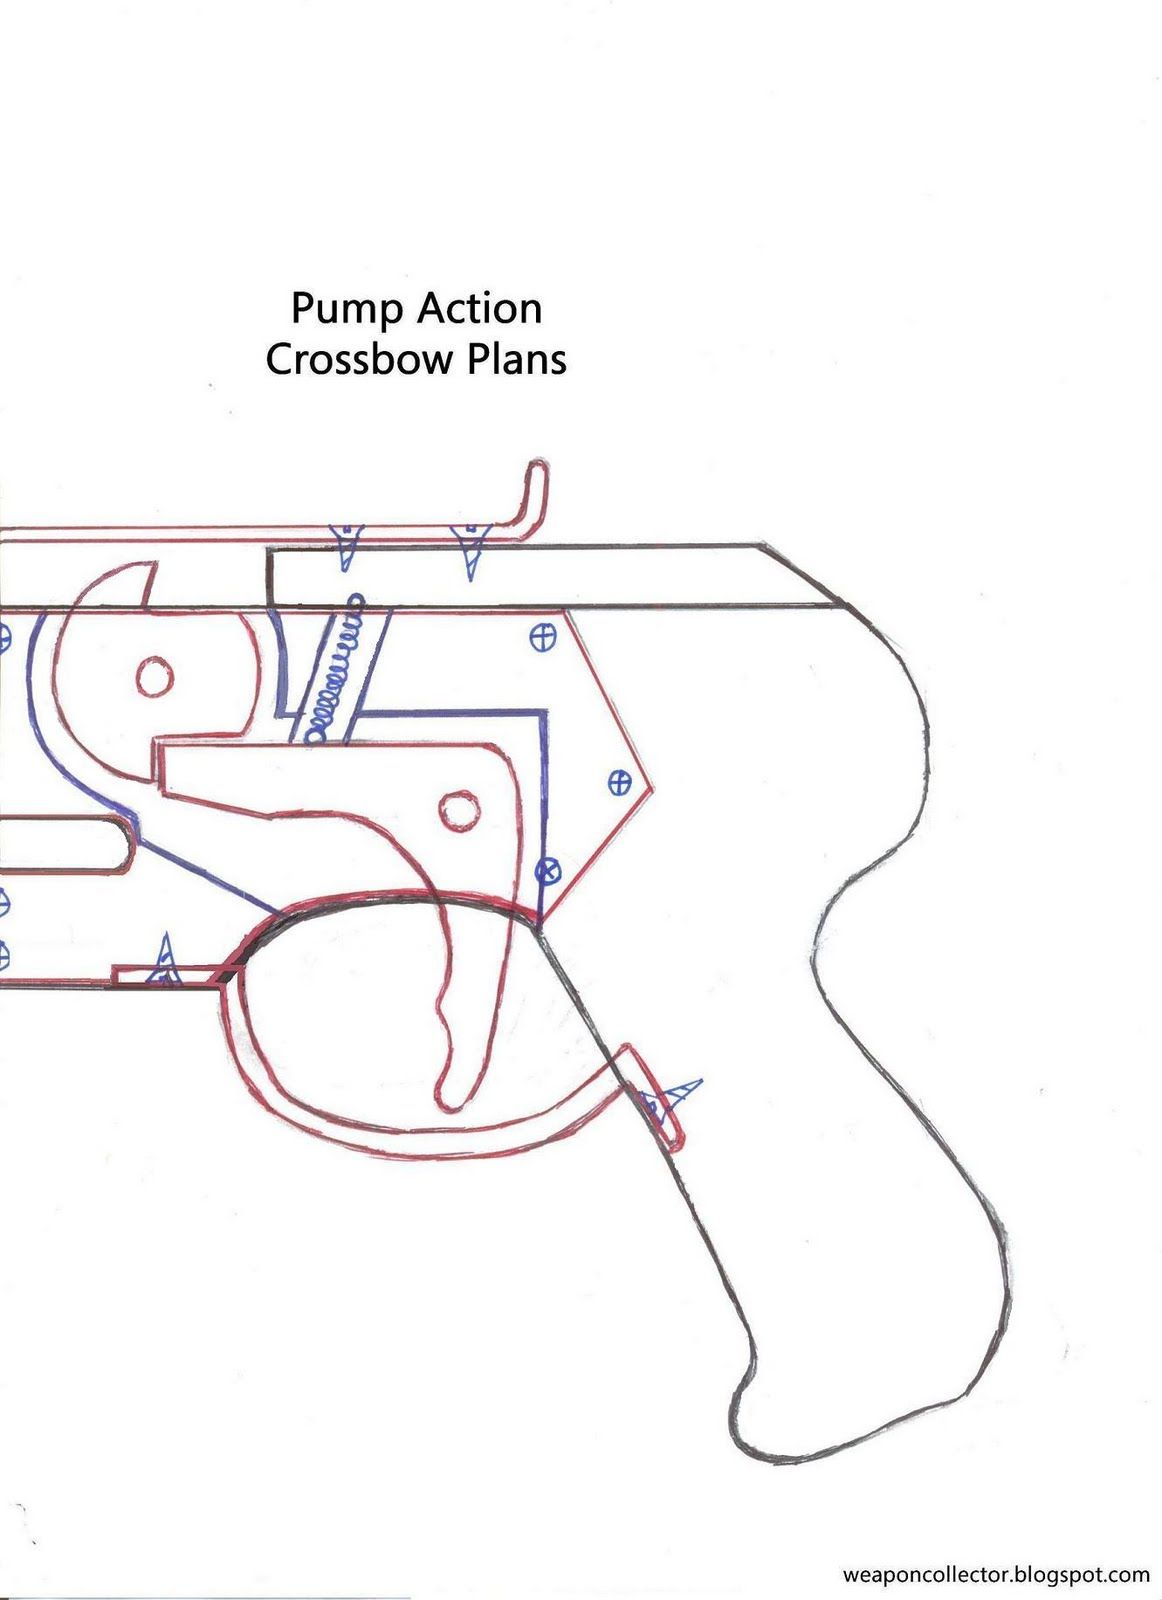 Horton Crossbow Parts Diagram Pdf Schematics Wiring Diagrams Trailer Pin By Keinslee Nicolas On Pump Action Pinterest Rh Com Trigger Mechanism